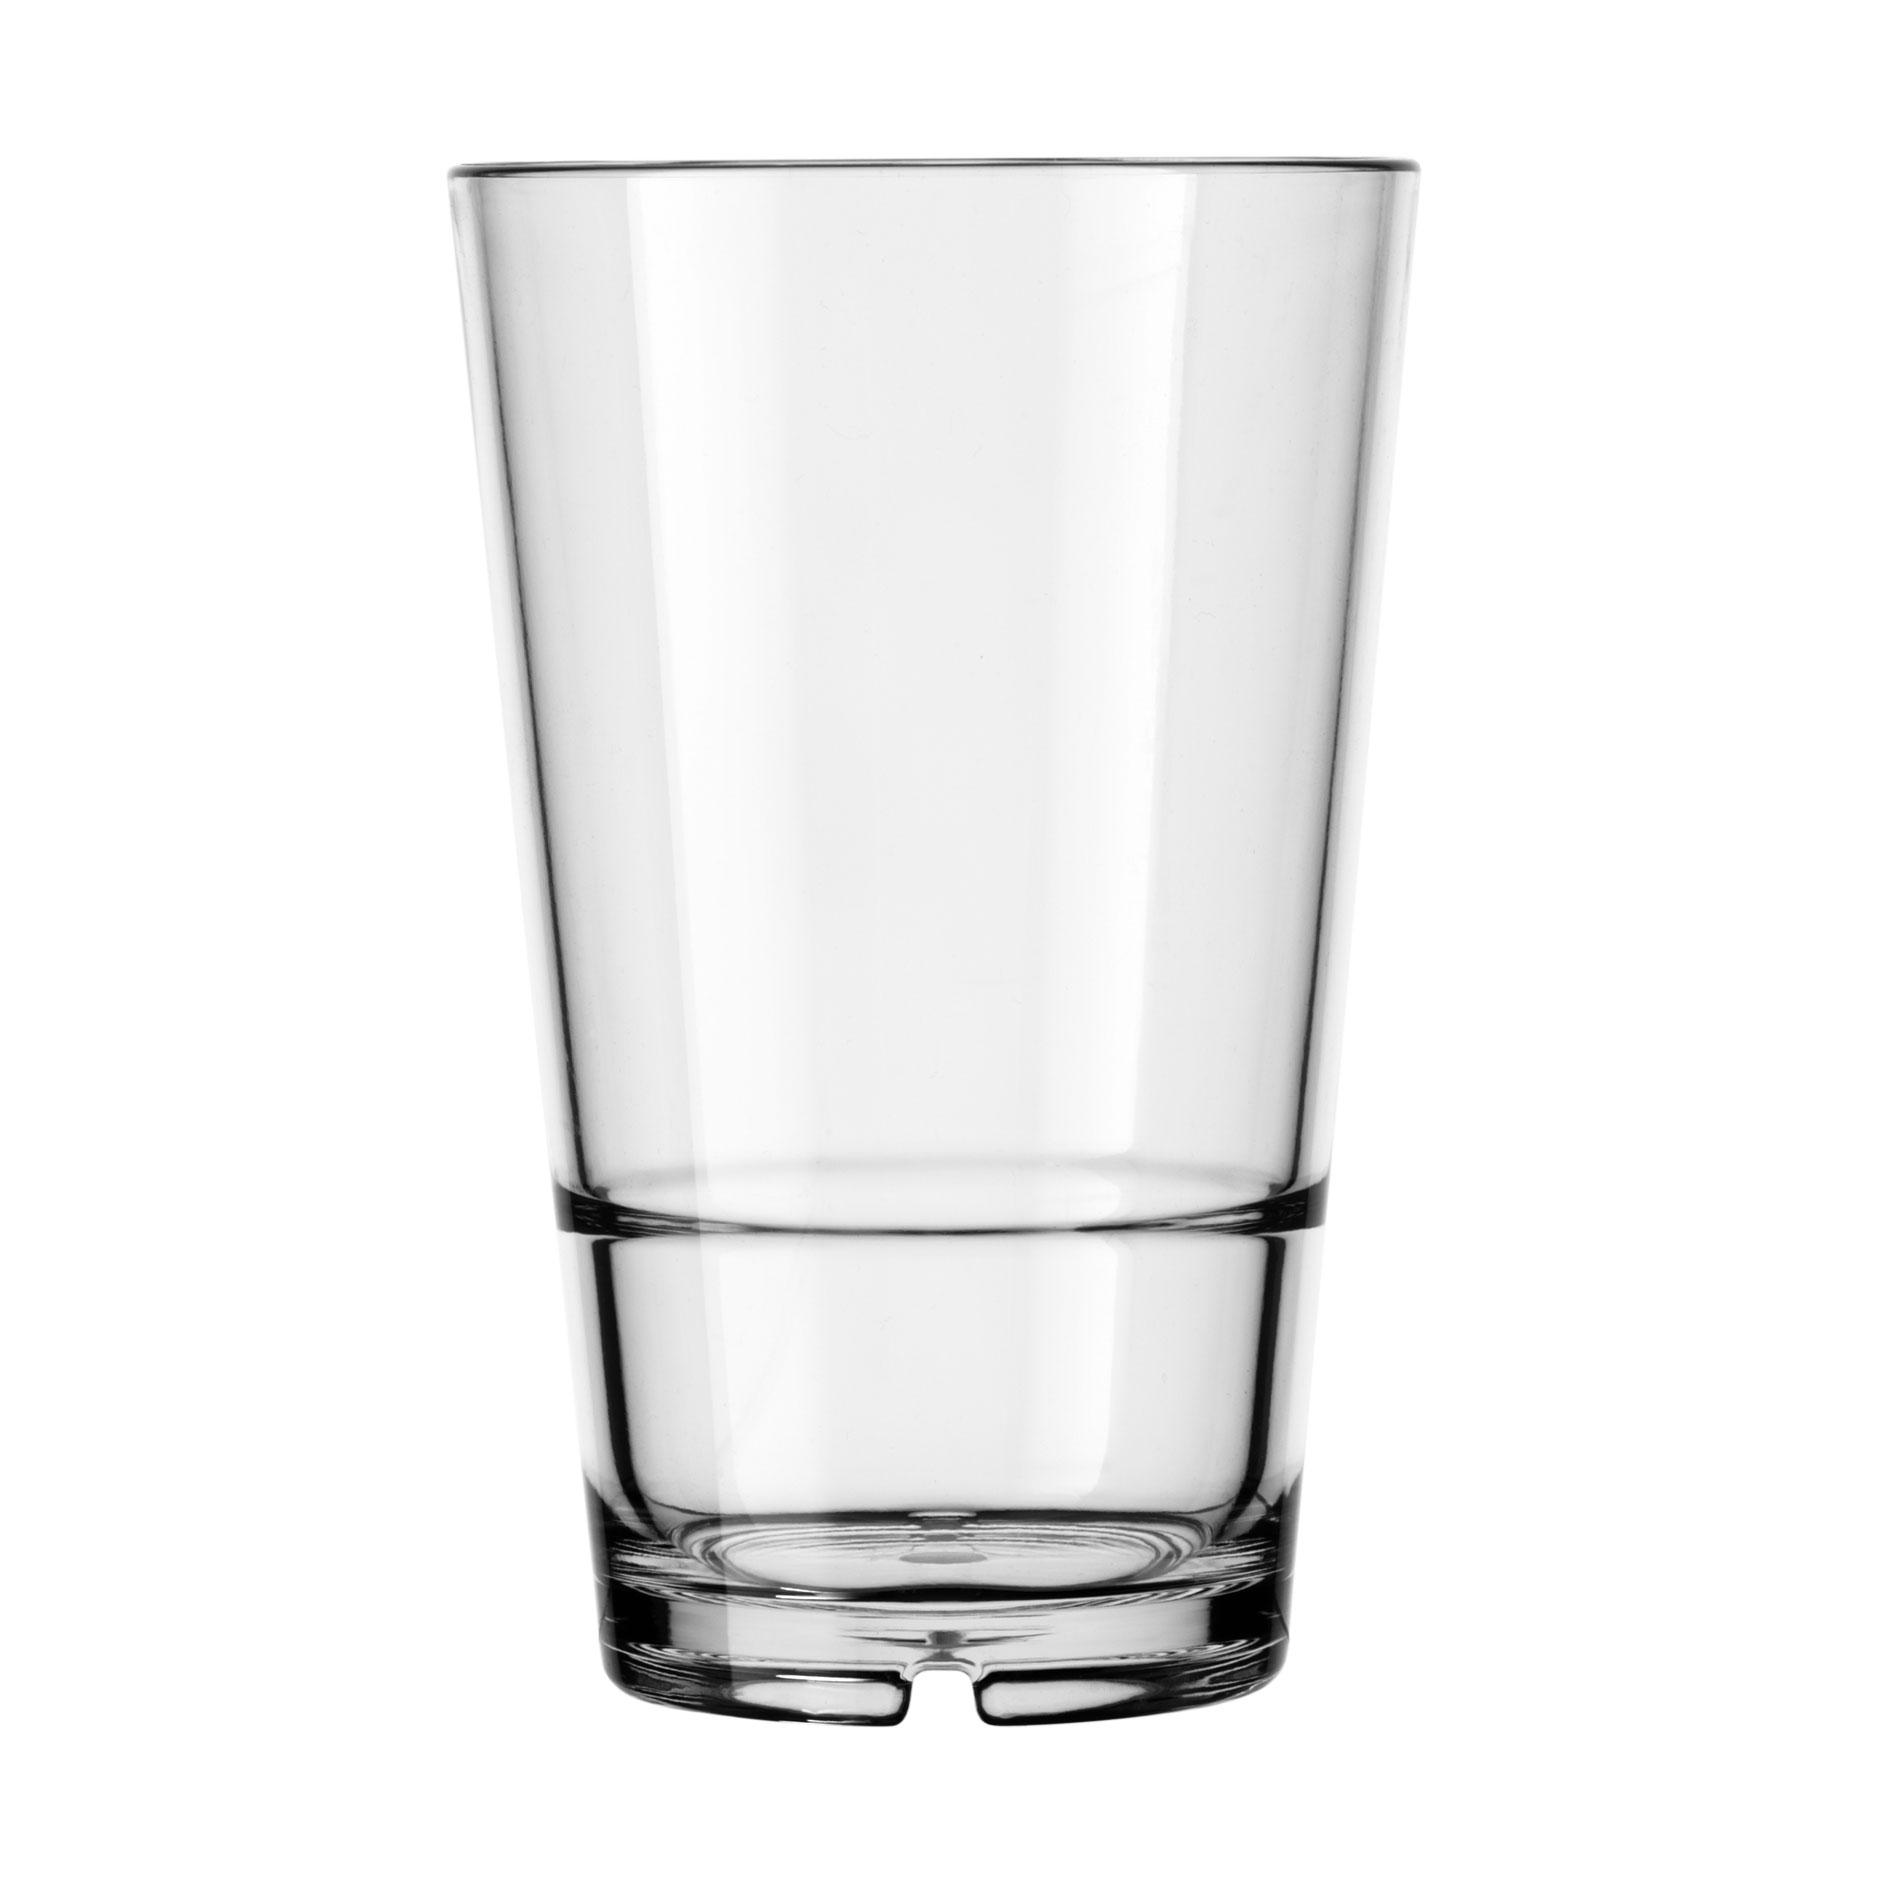 Libbey Glass 92447 glassware, plastic